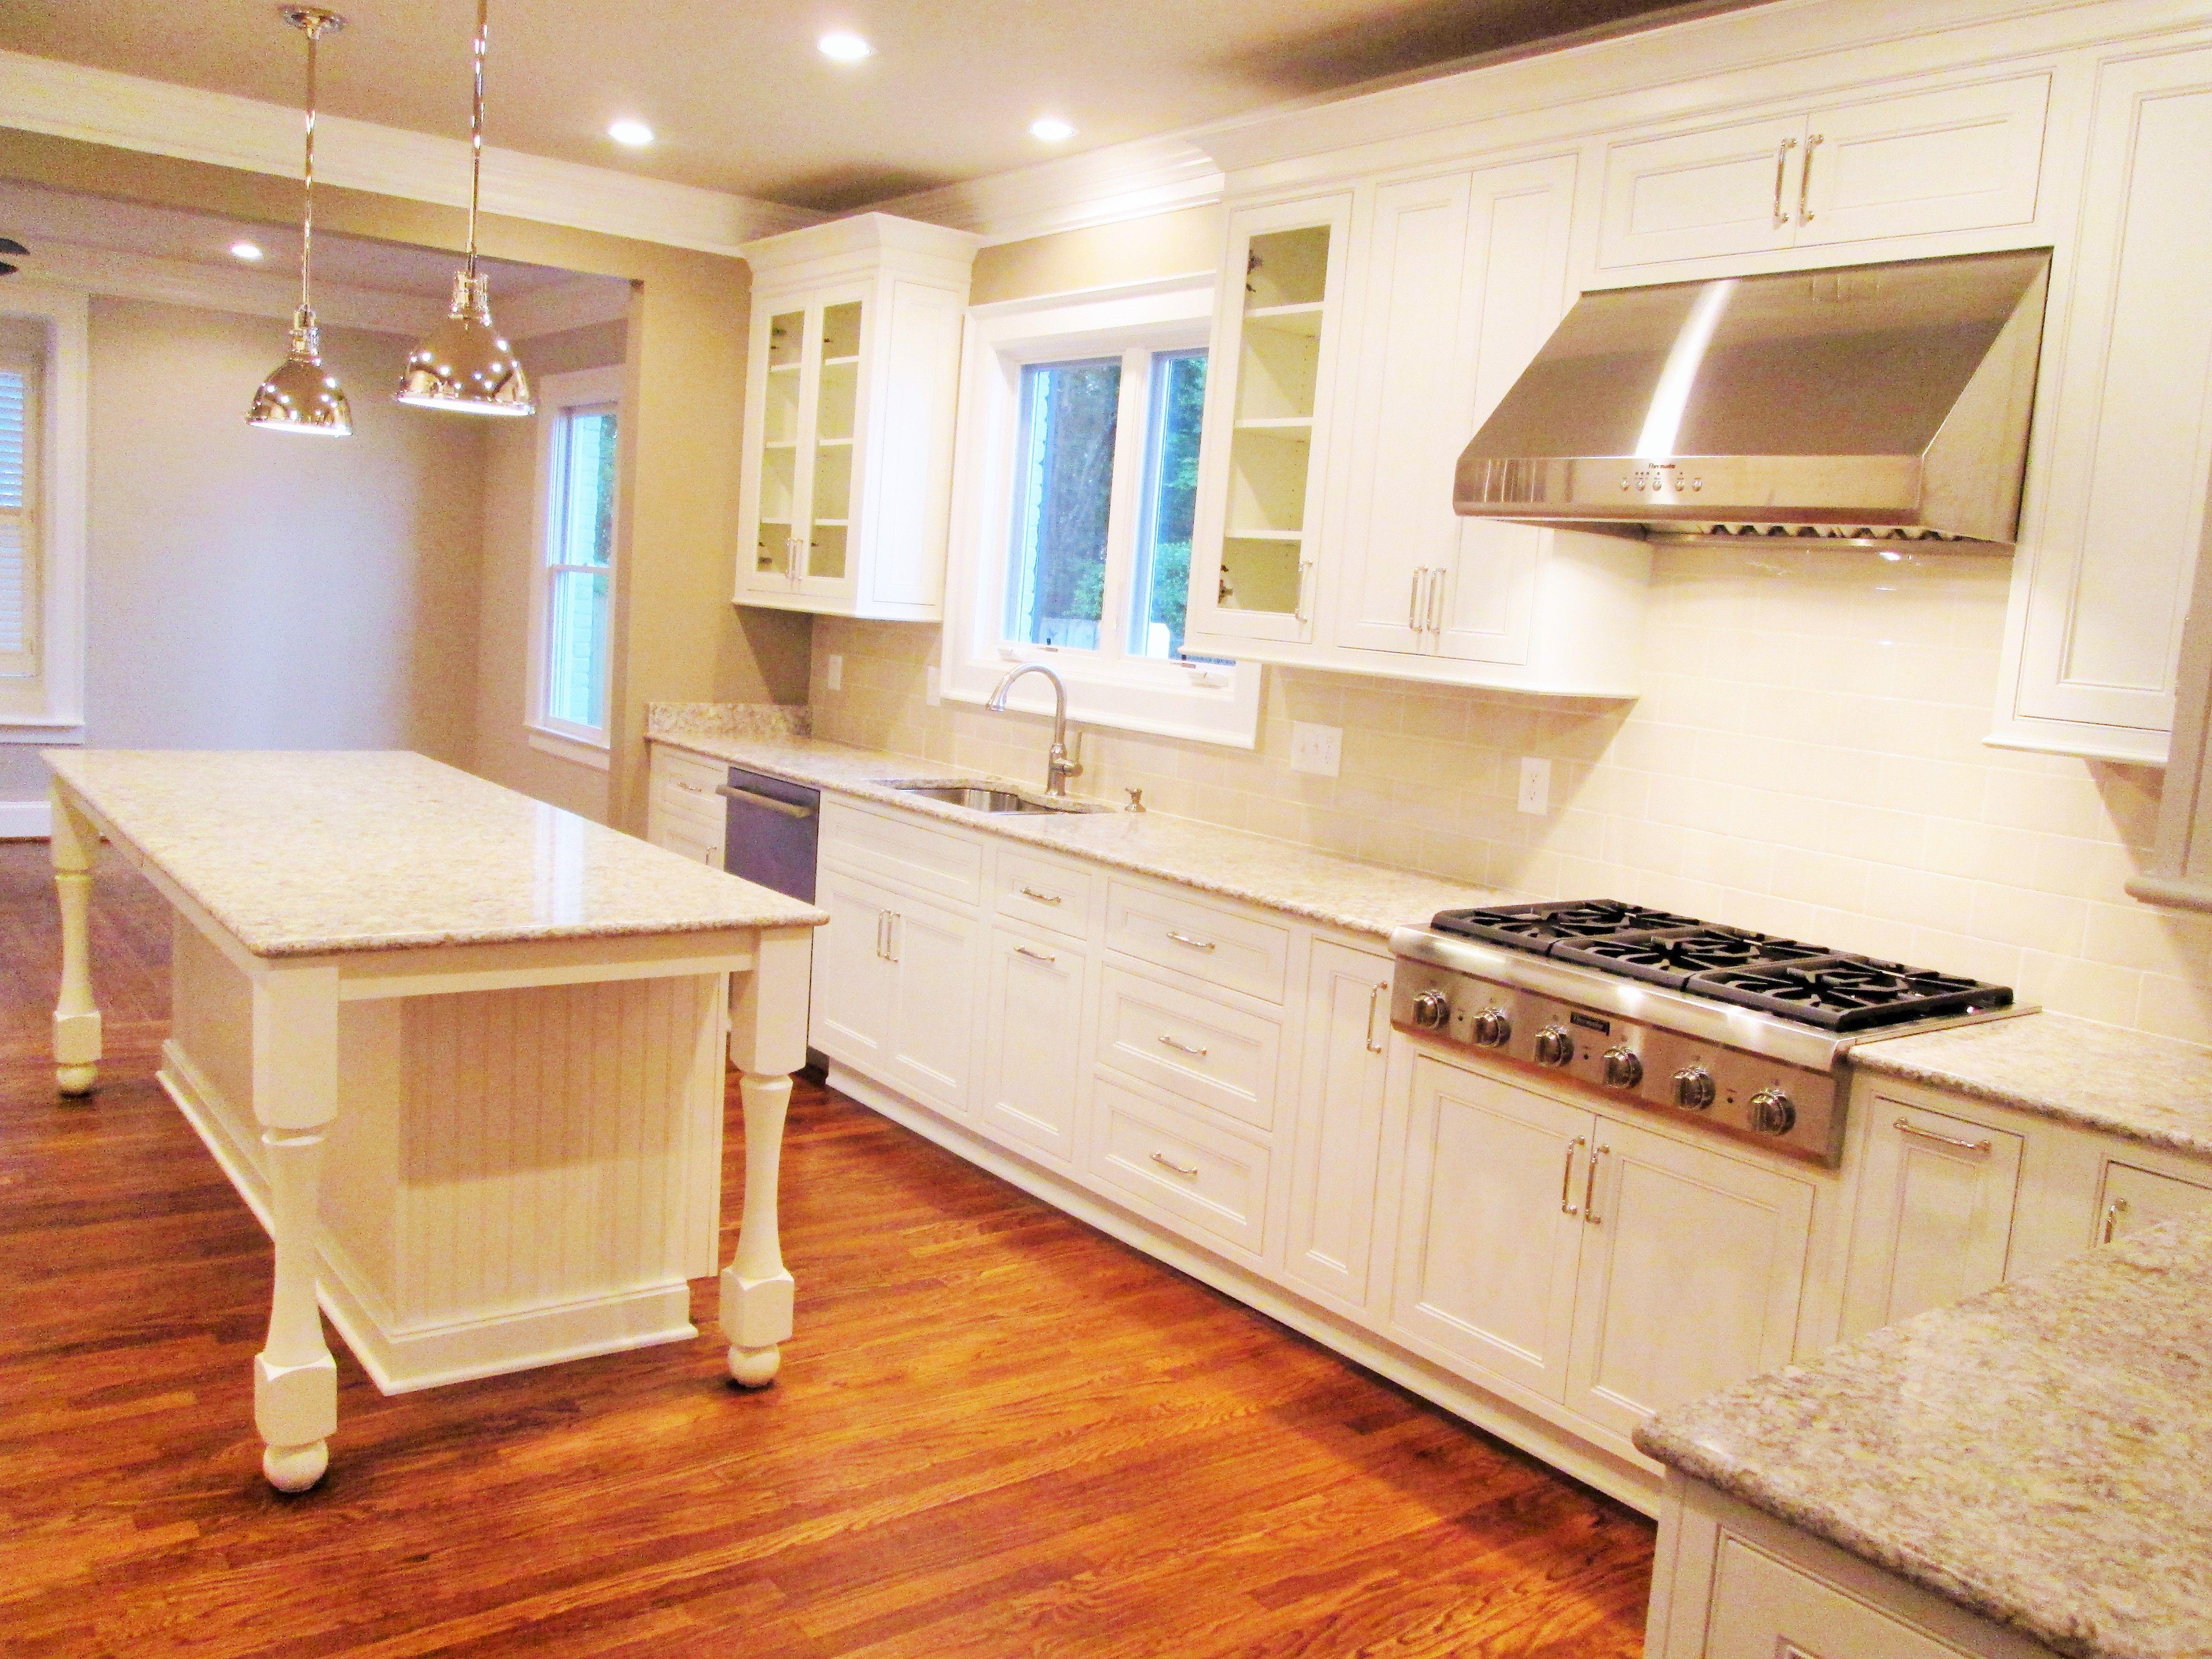 Kitchen Renovation By Penn Carpentry, Atlanta General Contractor #renovation  #kitchen